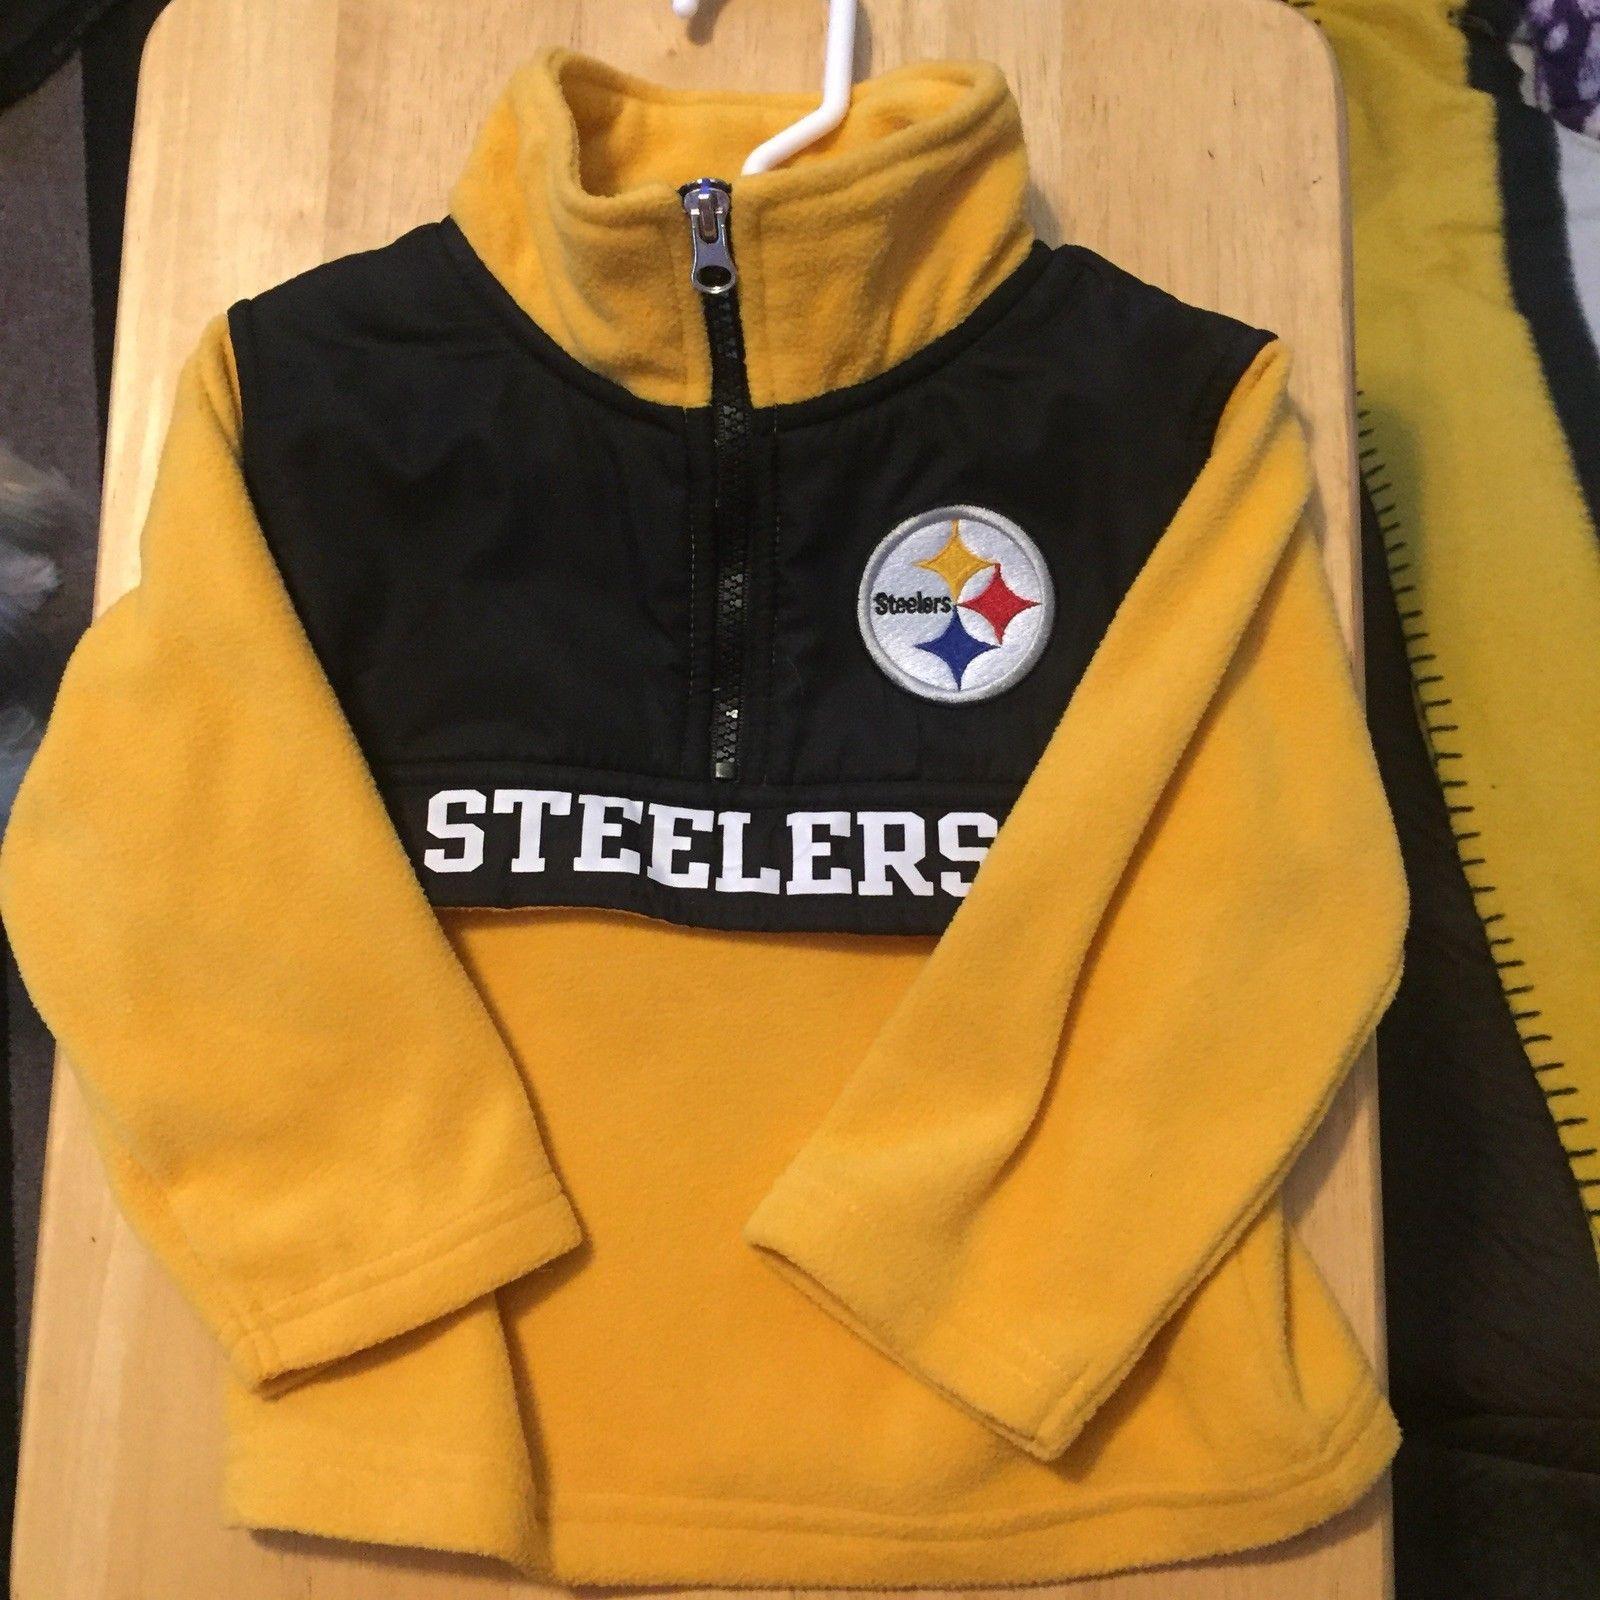 8ec6c308c NFL Team Apparel Fleece Zipper Jacket Used Child Size 2 Toddler ...